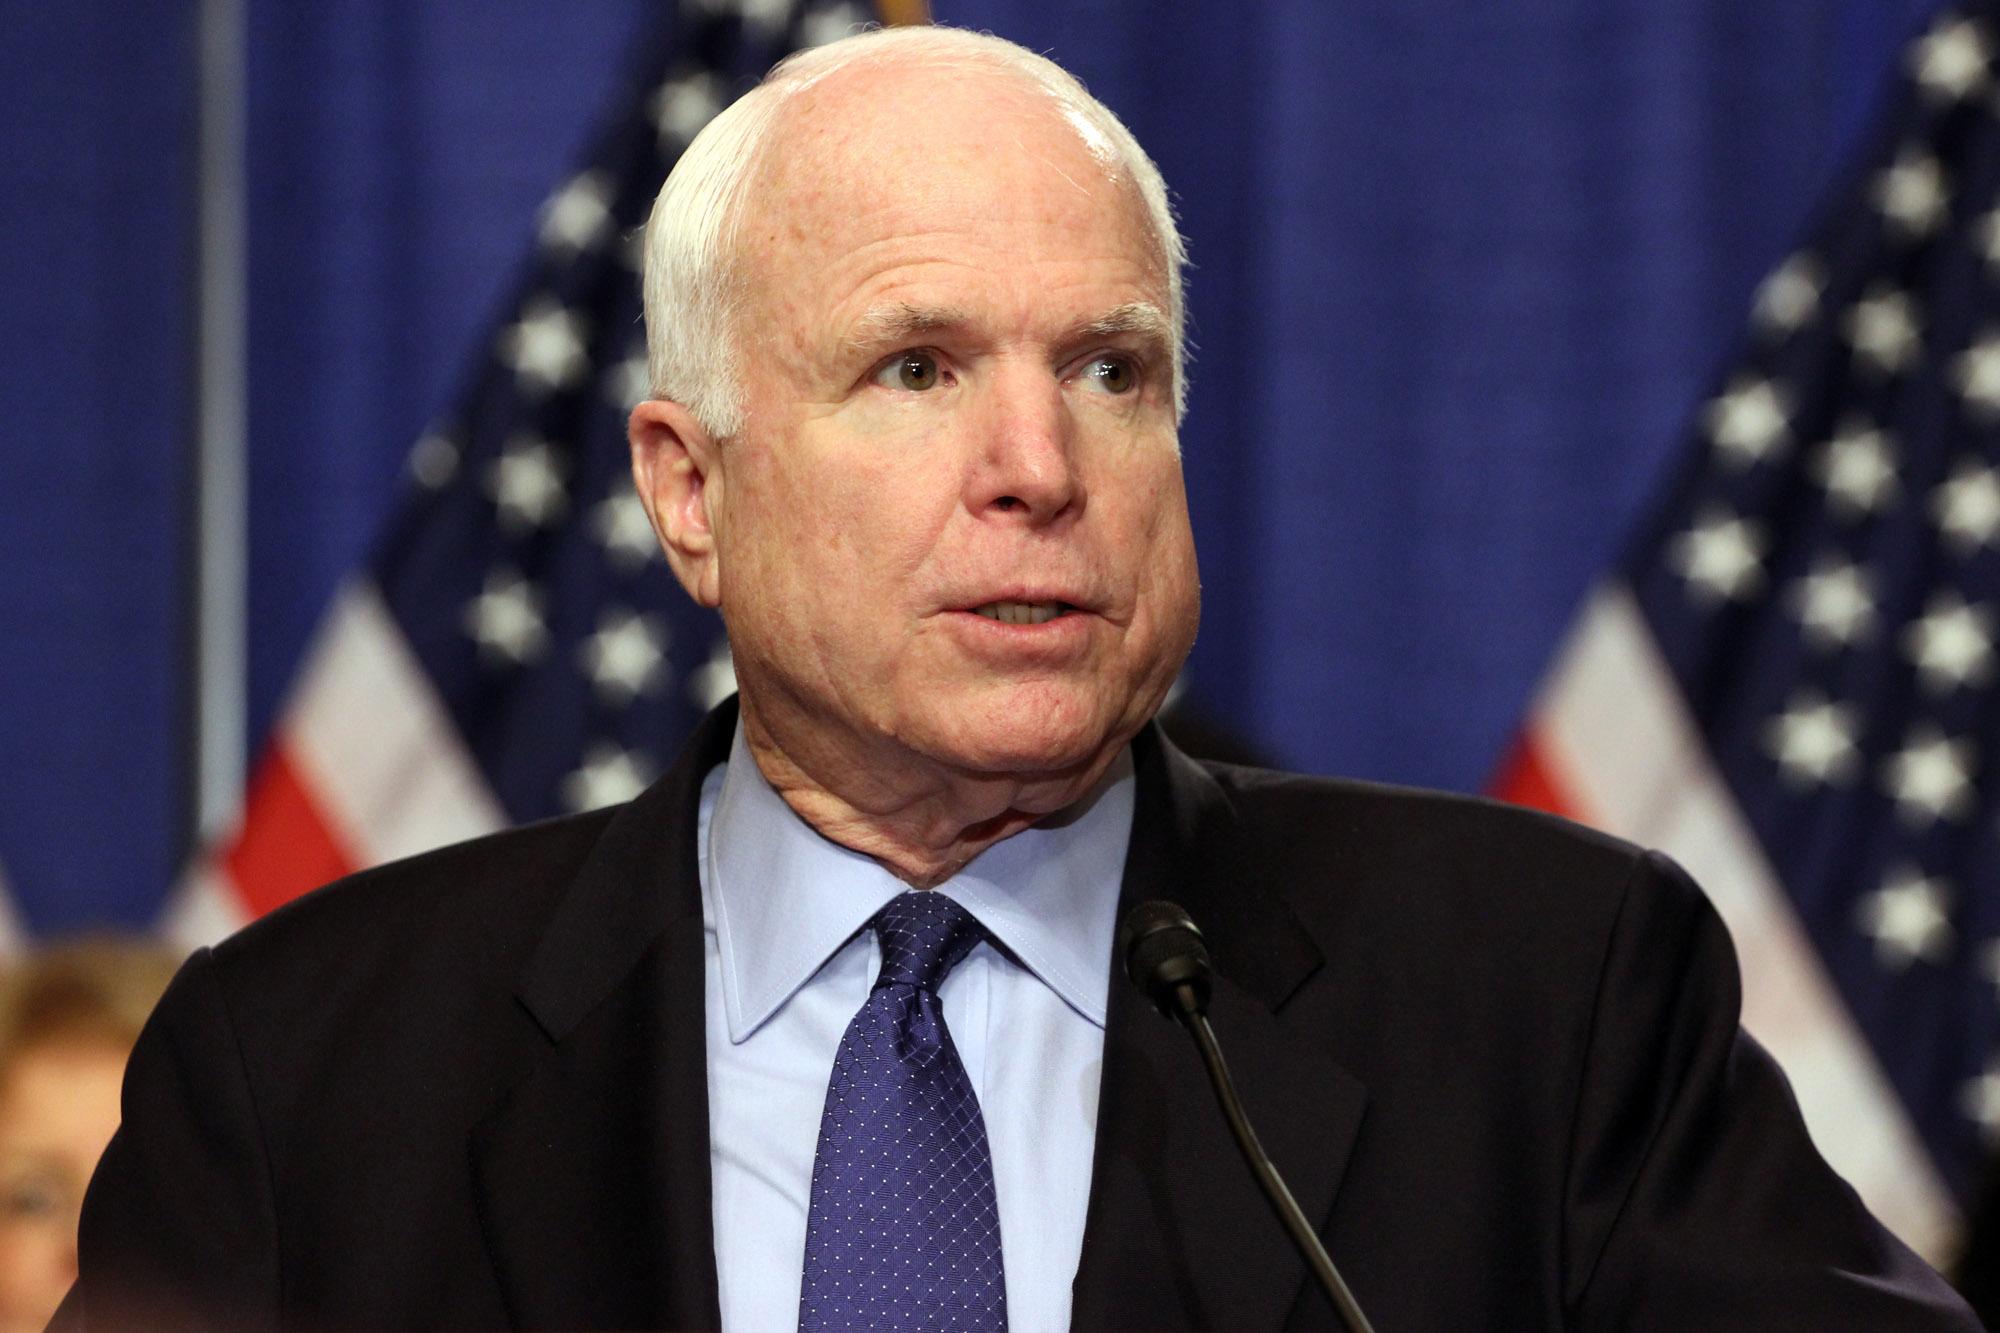 mccain 1 - Senator John McCain launches effort to block Trump's transgender troops ban with four other Senators